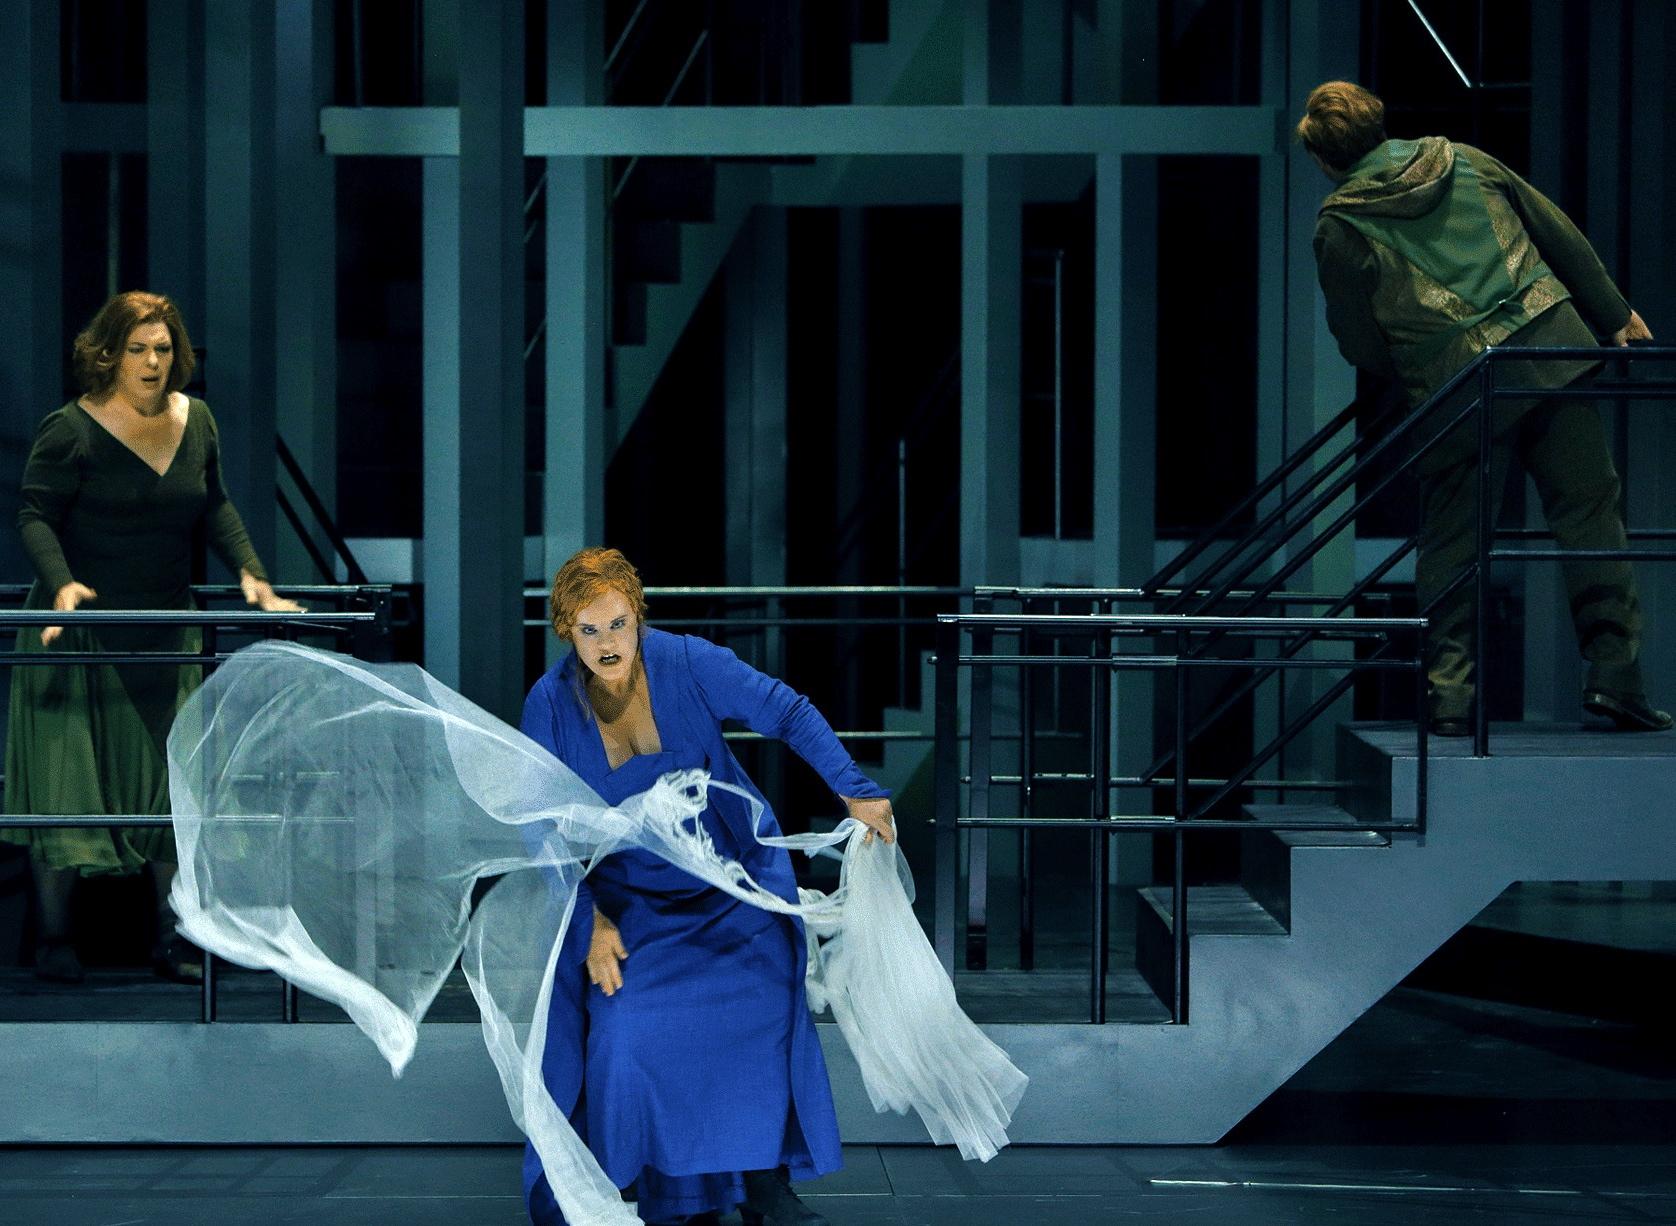 Festival de Bayreuth Tristan und Isolde